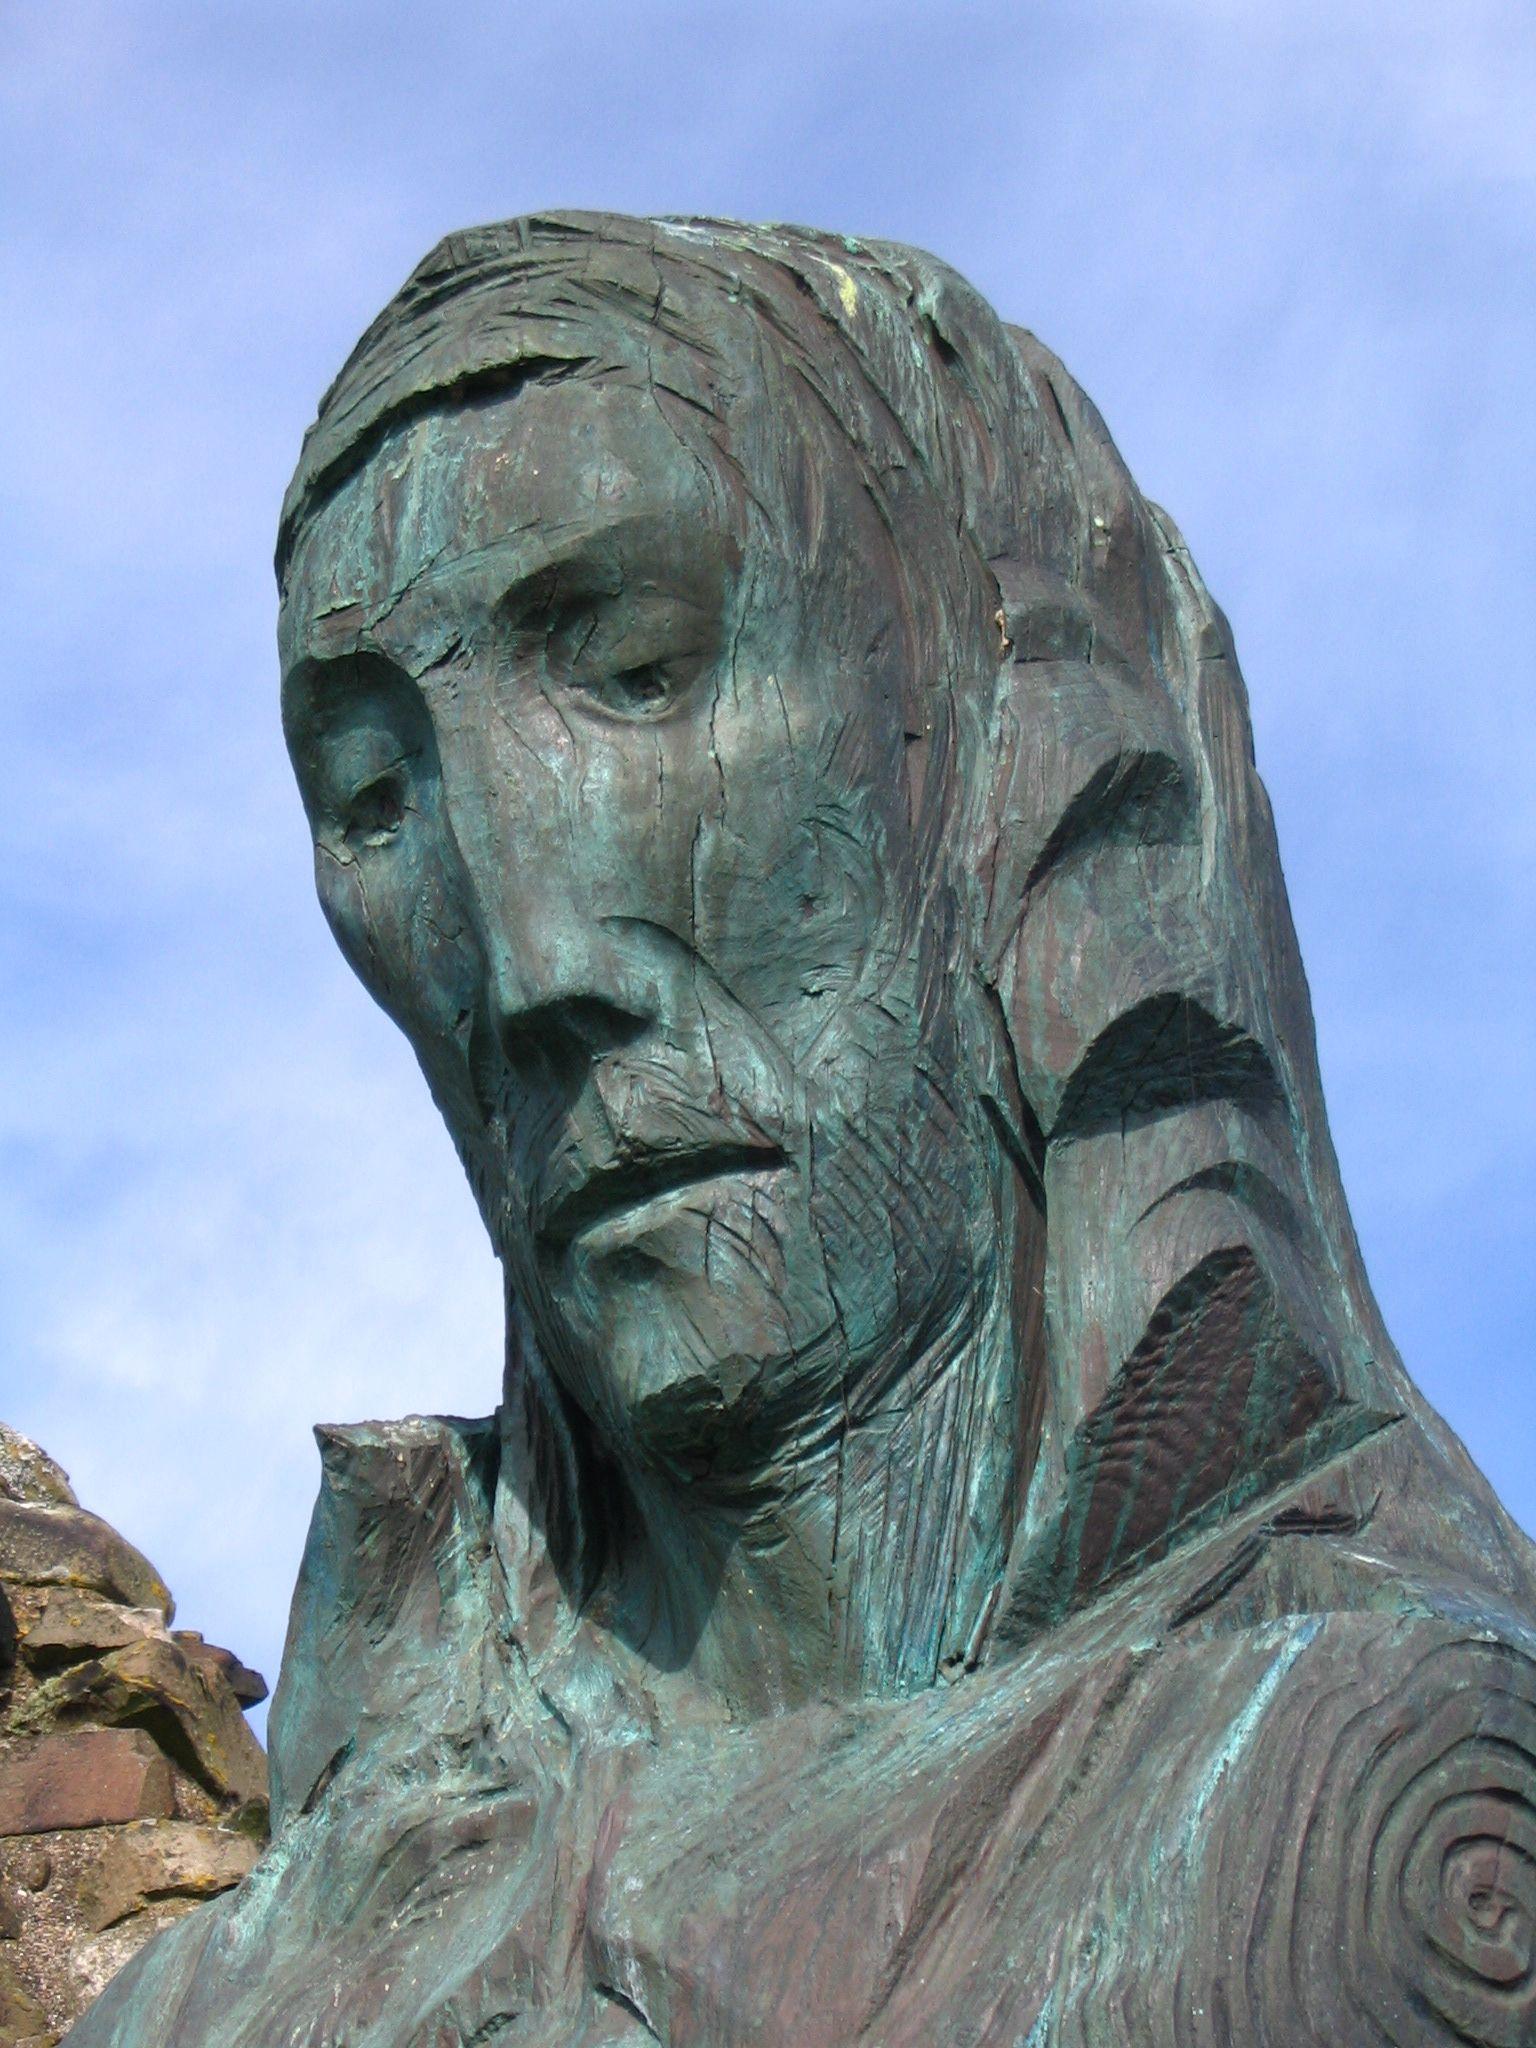 1 In 793 A Viking Raid On Lindisfarne Caused Much